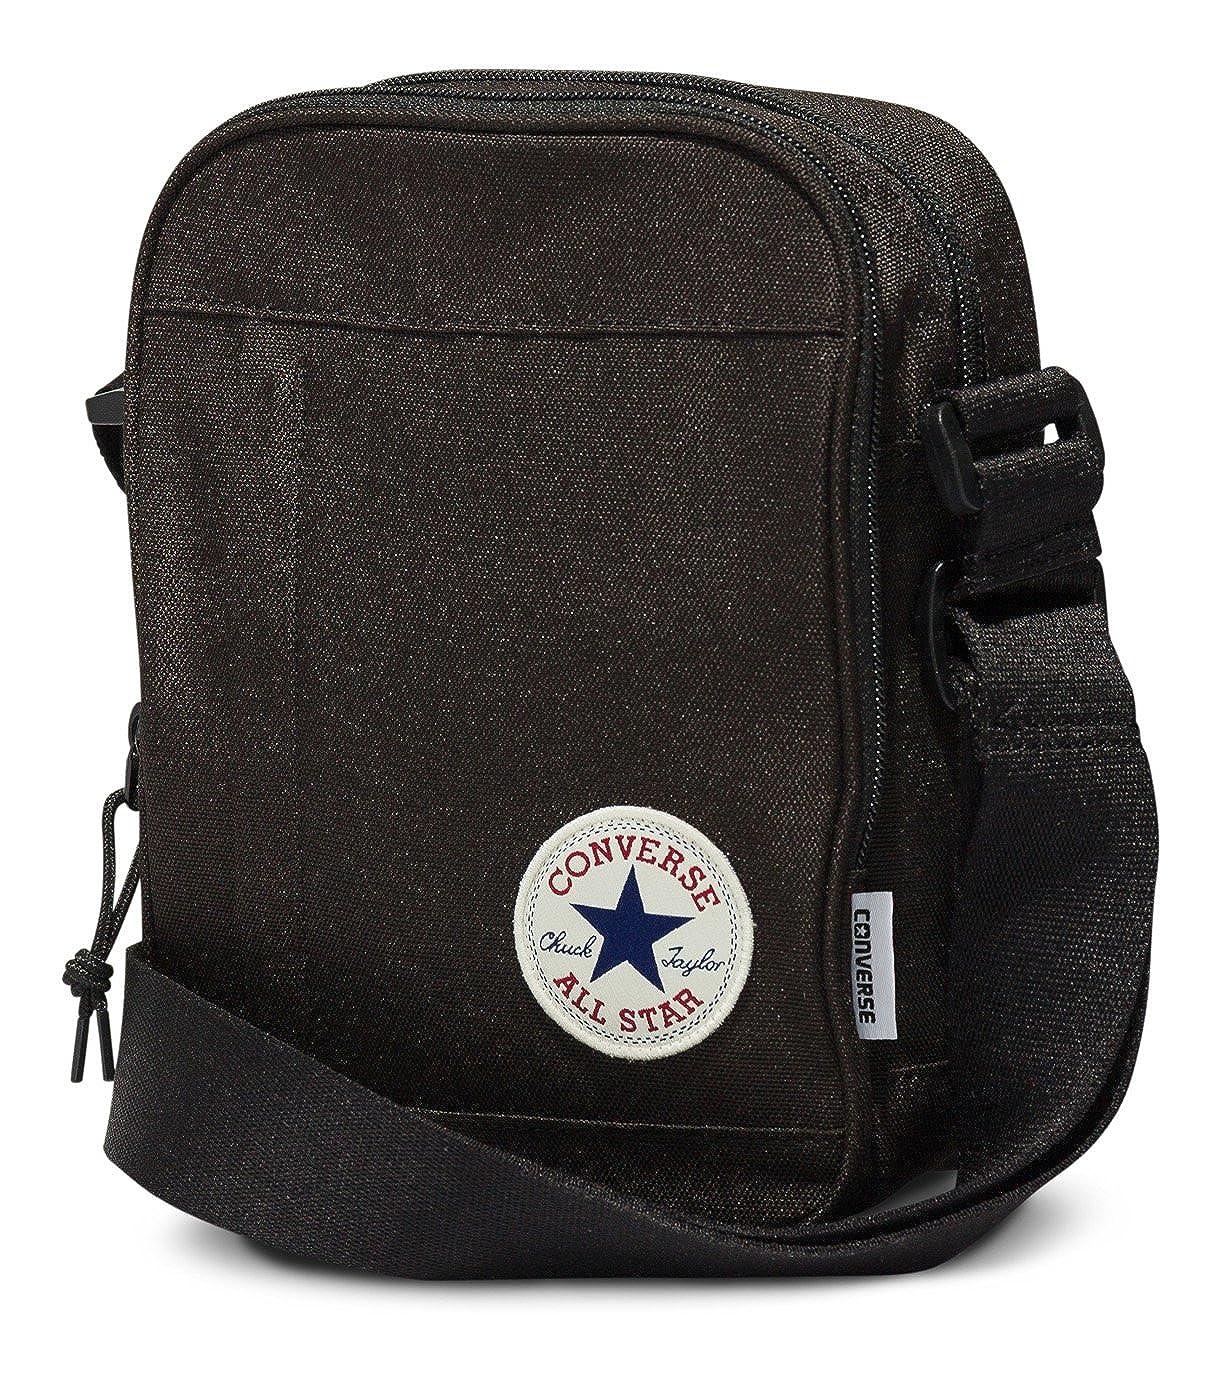 aca2438c4 Amazon.com: Converse Cross Body Mini Bags Black - One Size: Urban Surfer UK